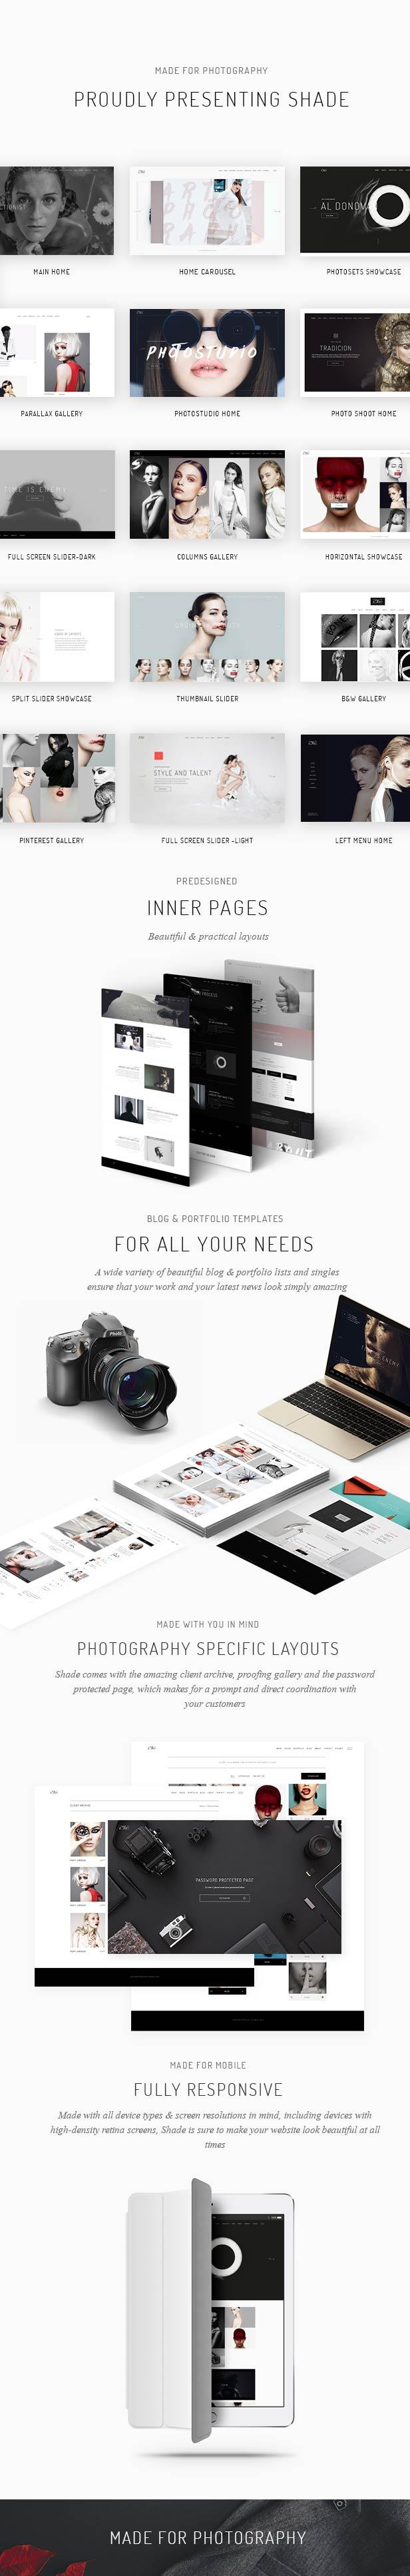 Shade - Photo Studio Theme - 1